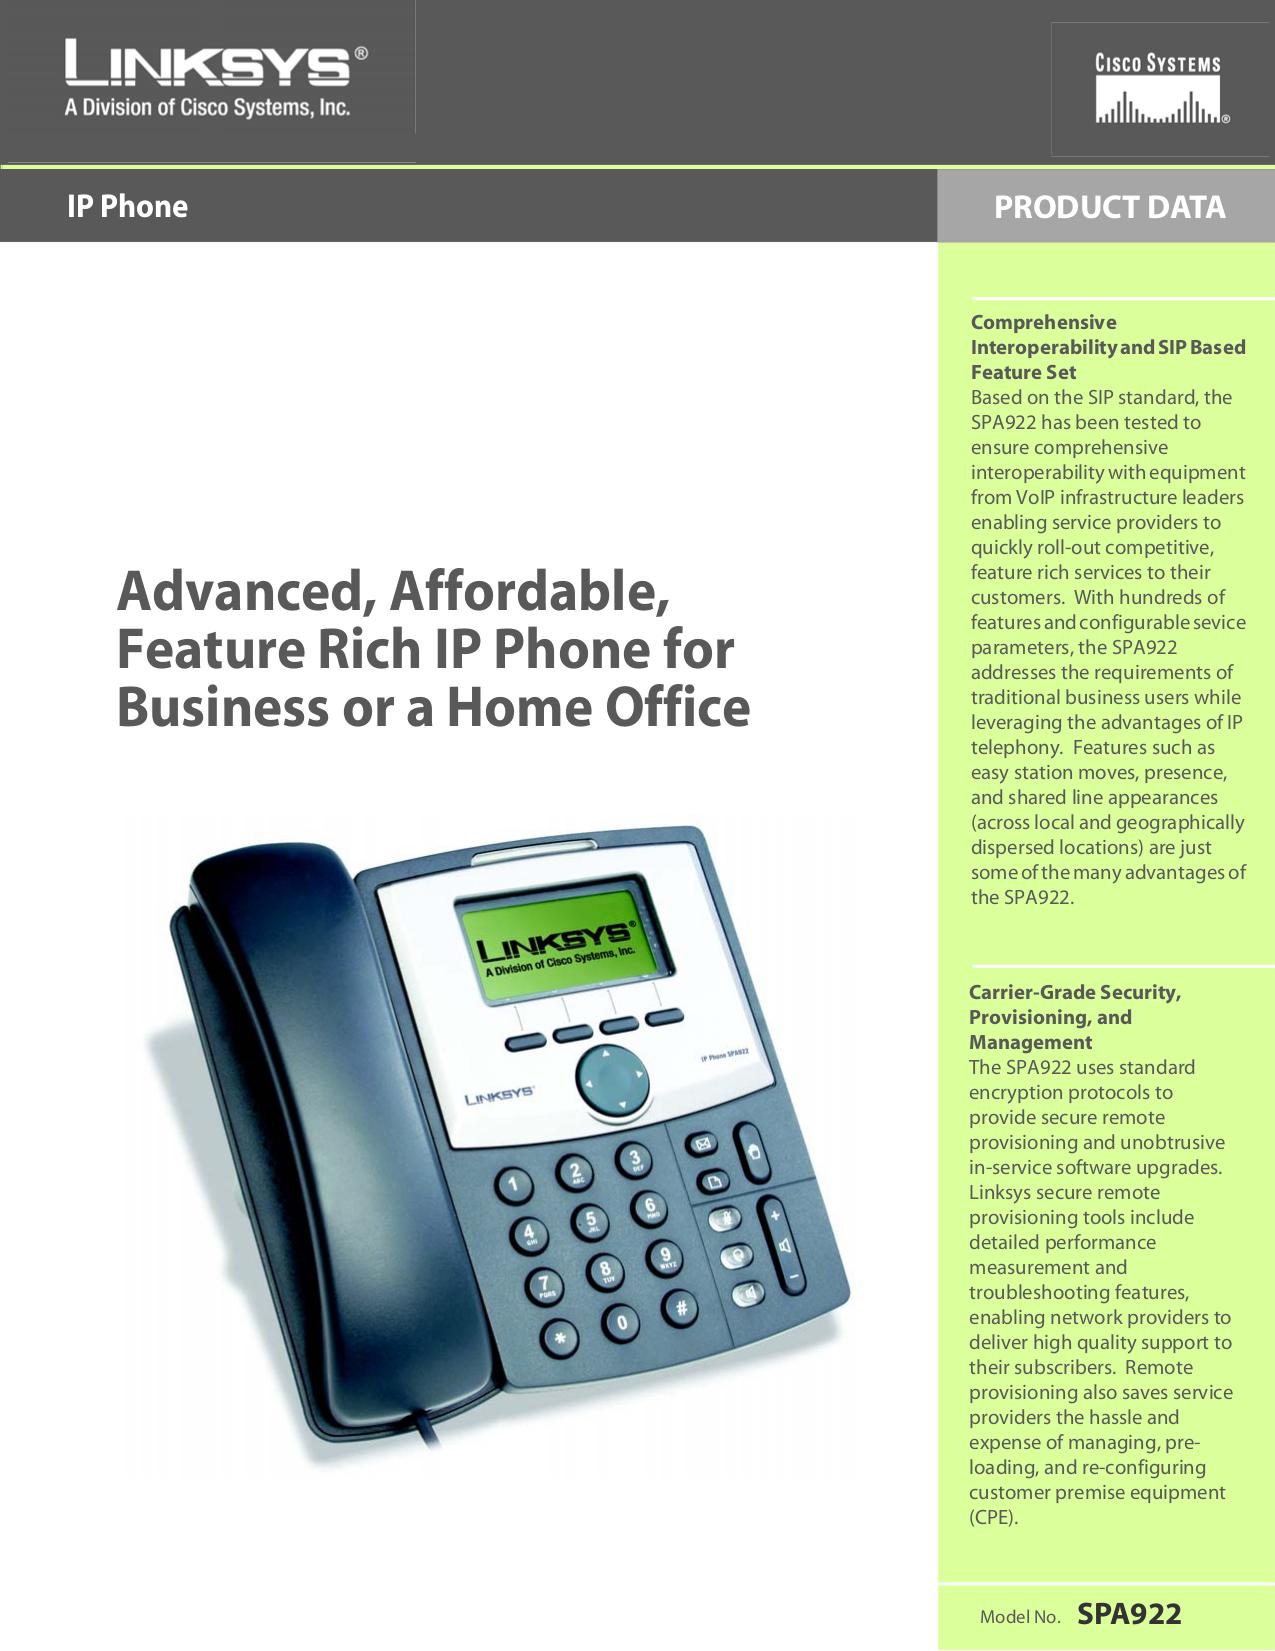 pdf for Linksys Telephone SPA922 manual